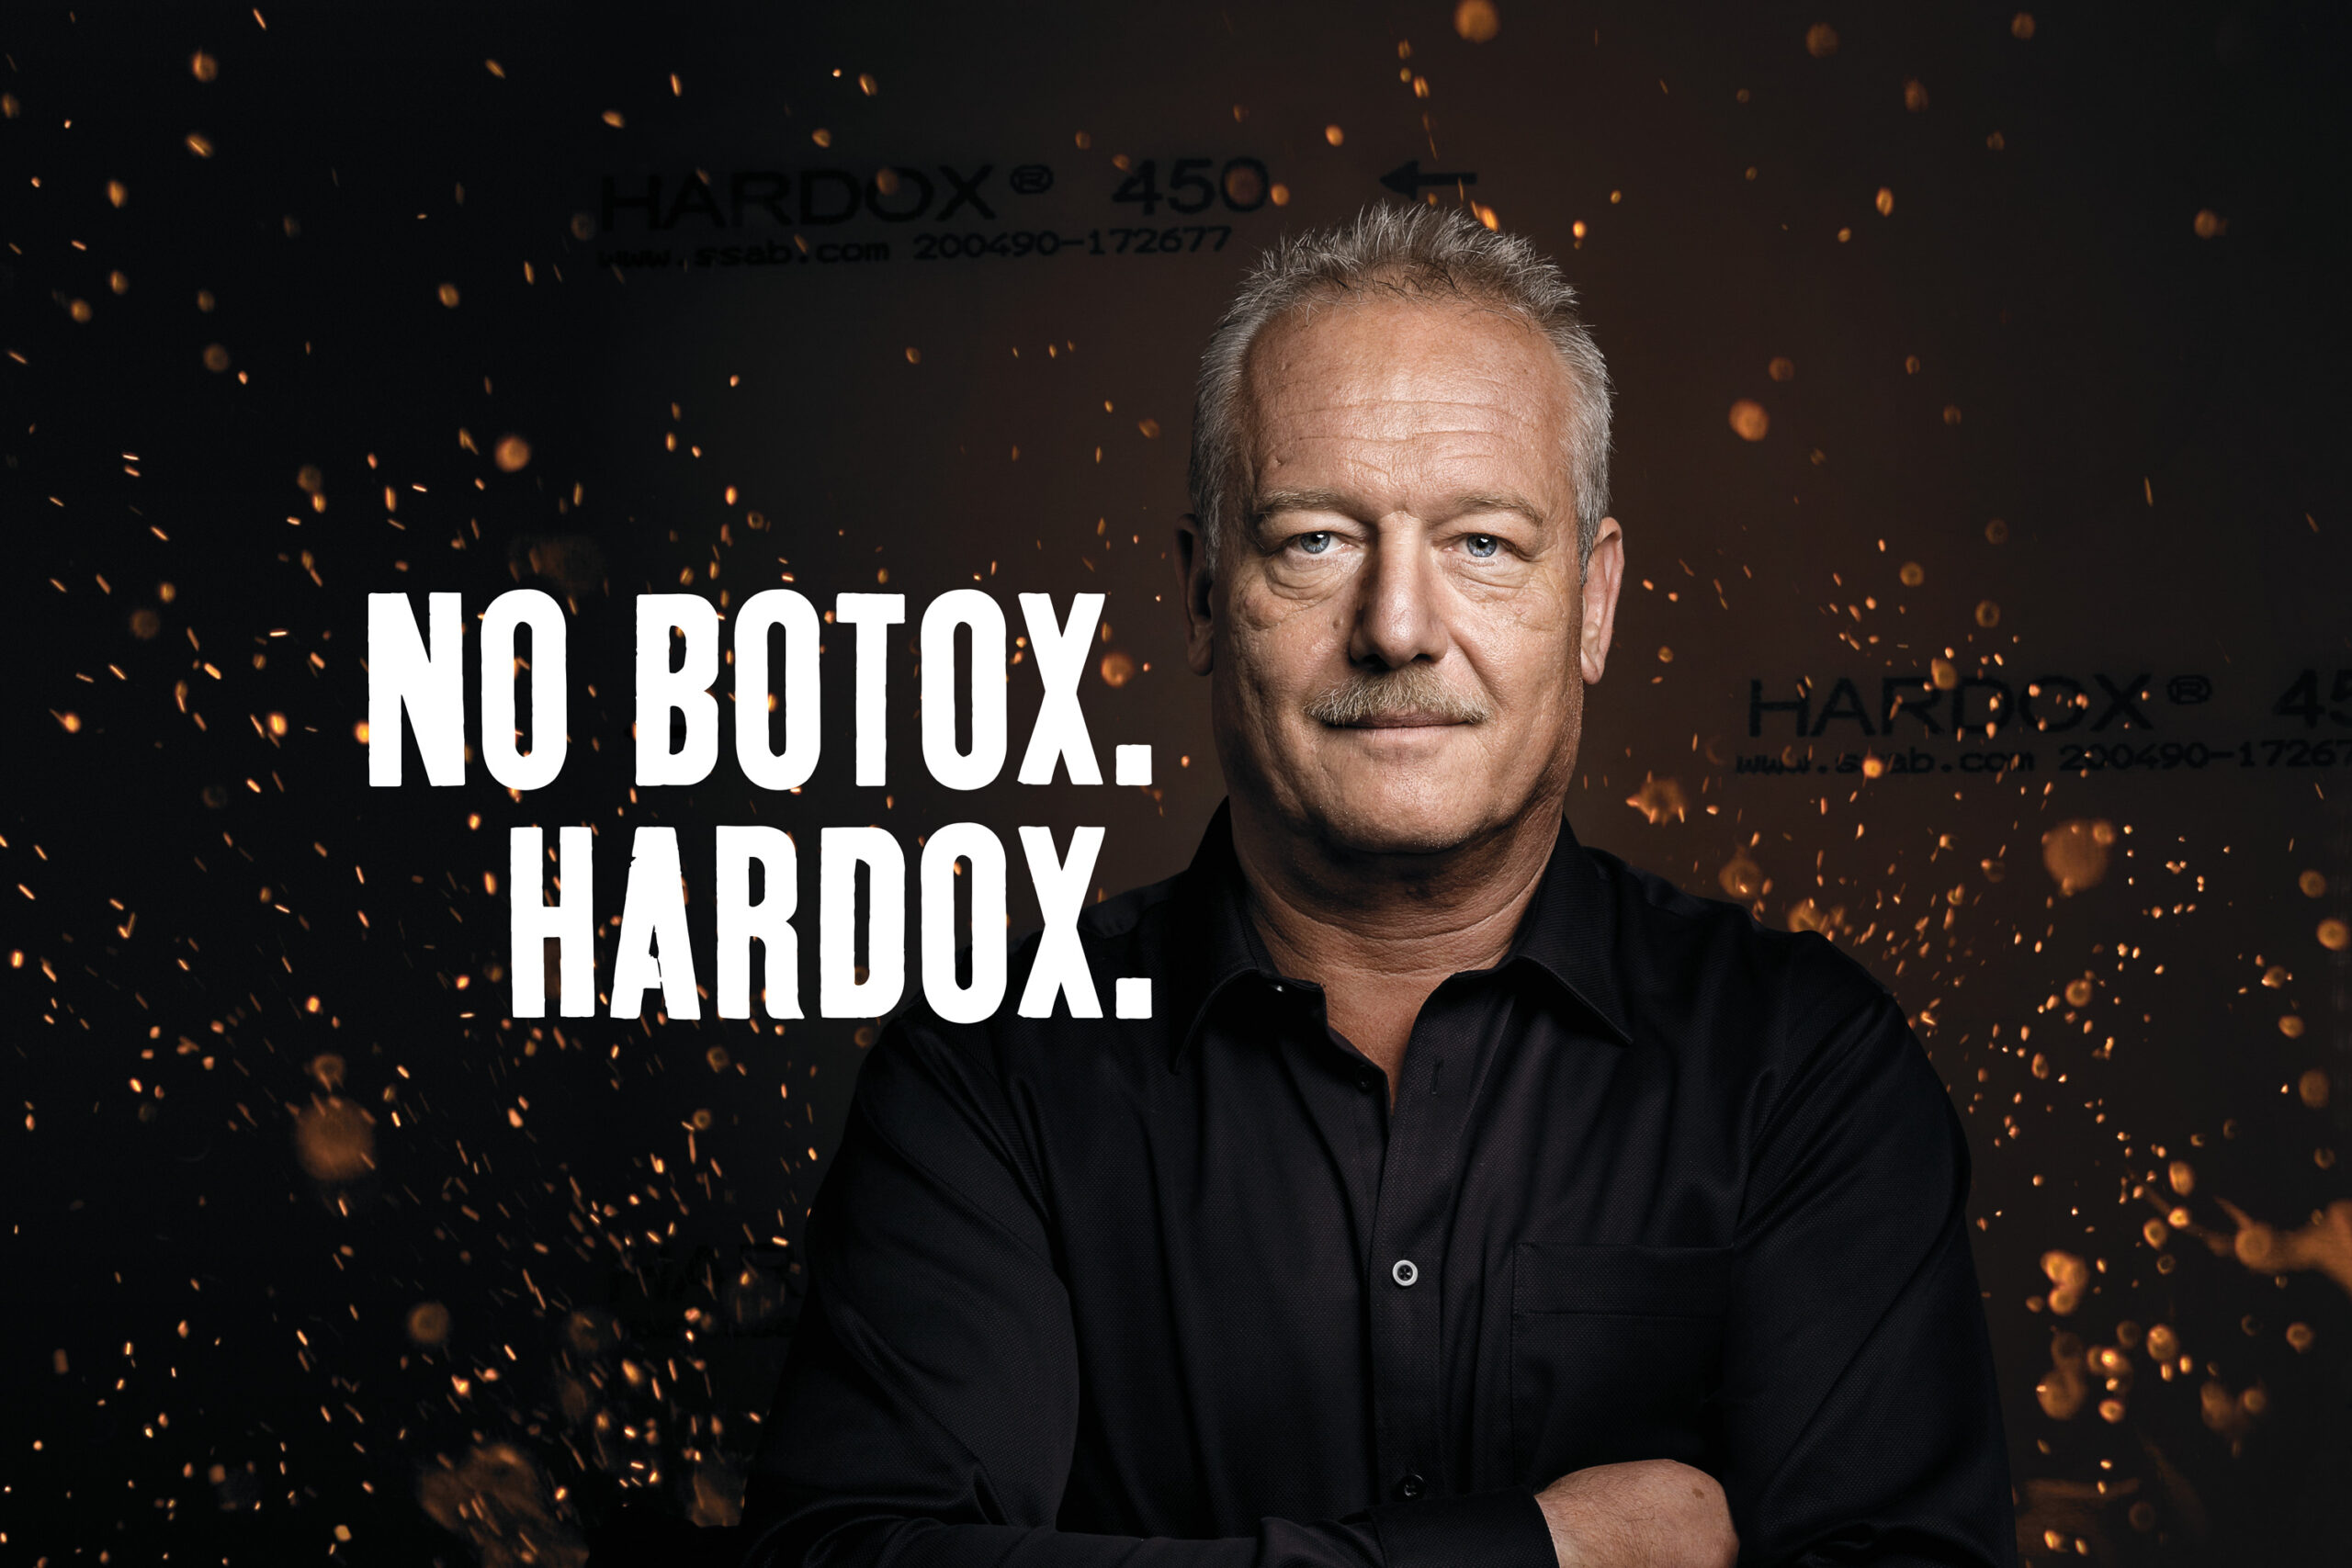 Meier & Kamer Businessfotografie: Cero AG, Robert Cencig, No Botox. Hardox.